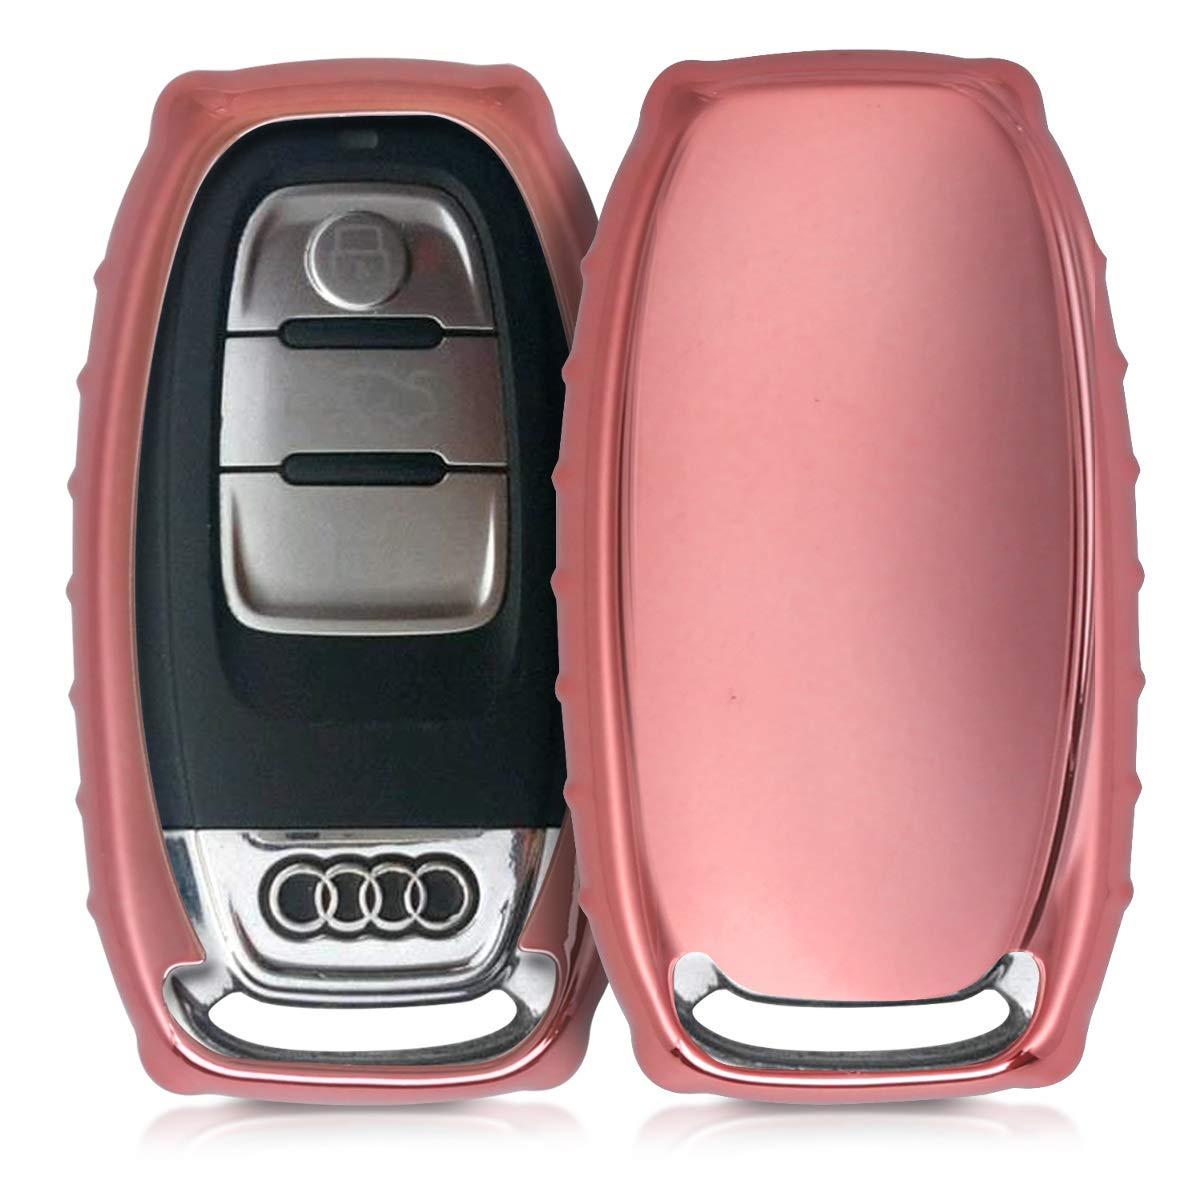 Soft TPU Silicone Protective Key Fob Cover for Audi 3 Button Car Key Keyless Go kwmobile Car Key Cover for Audi Silver//Metallic Silver